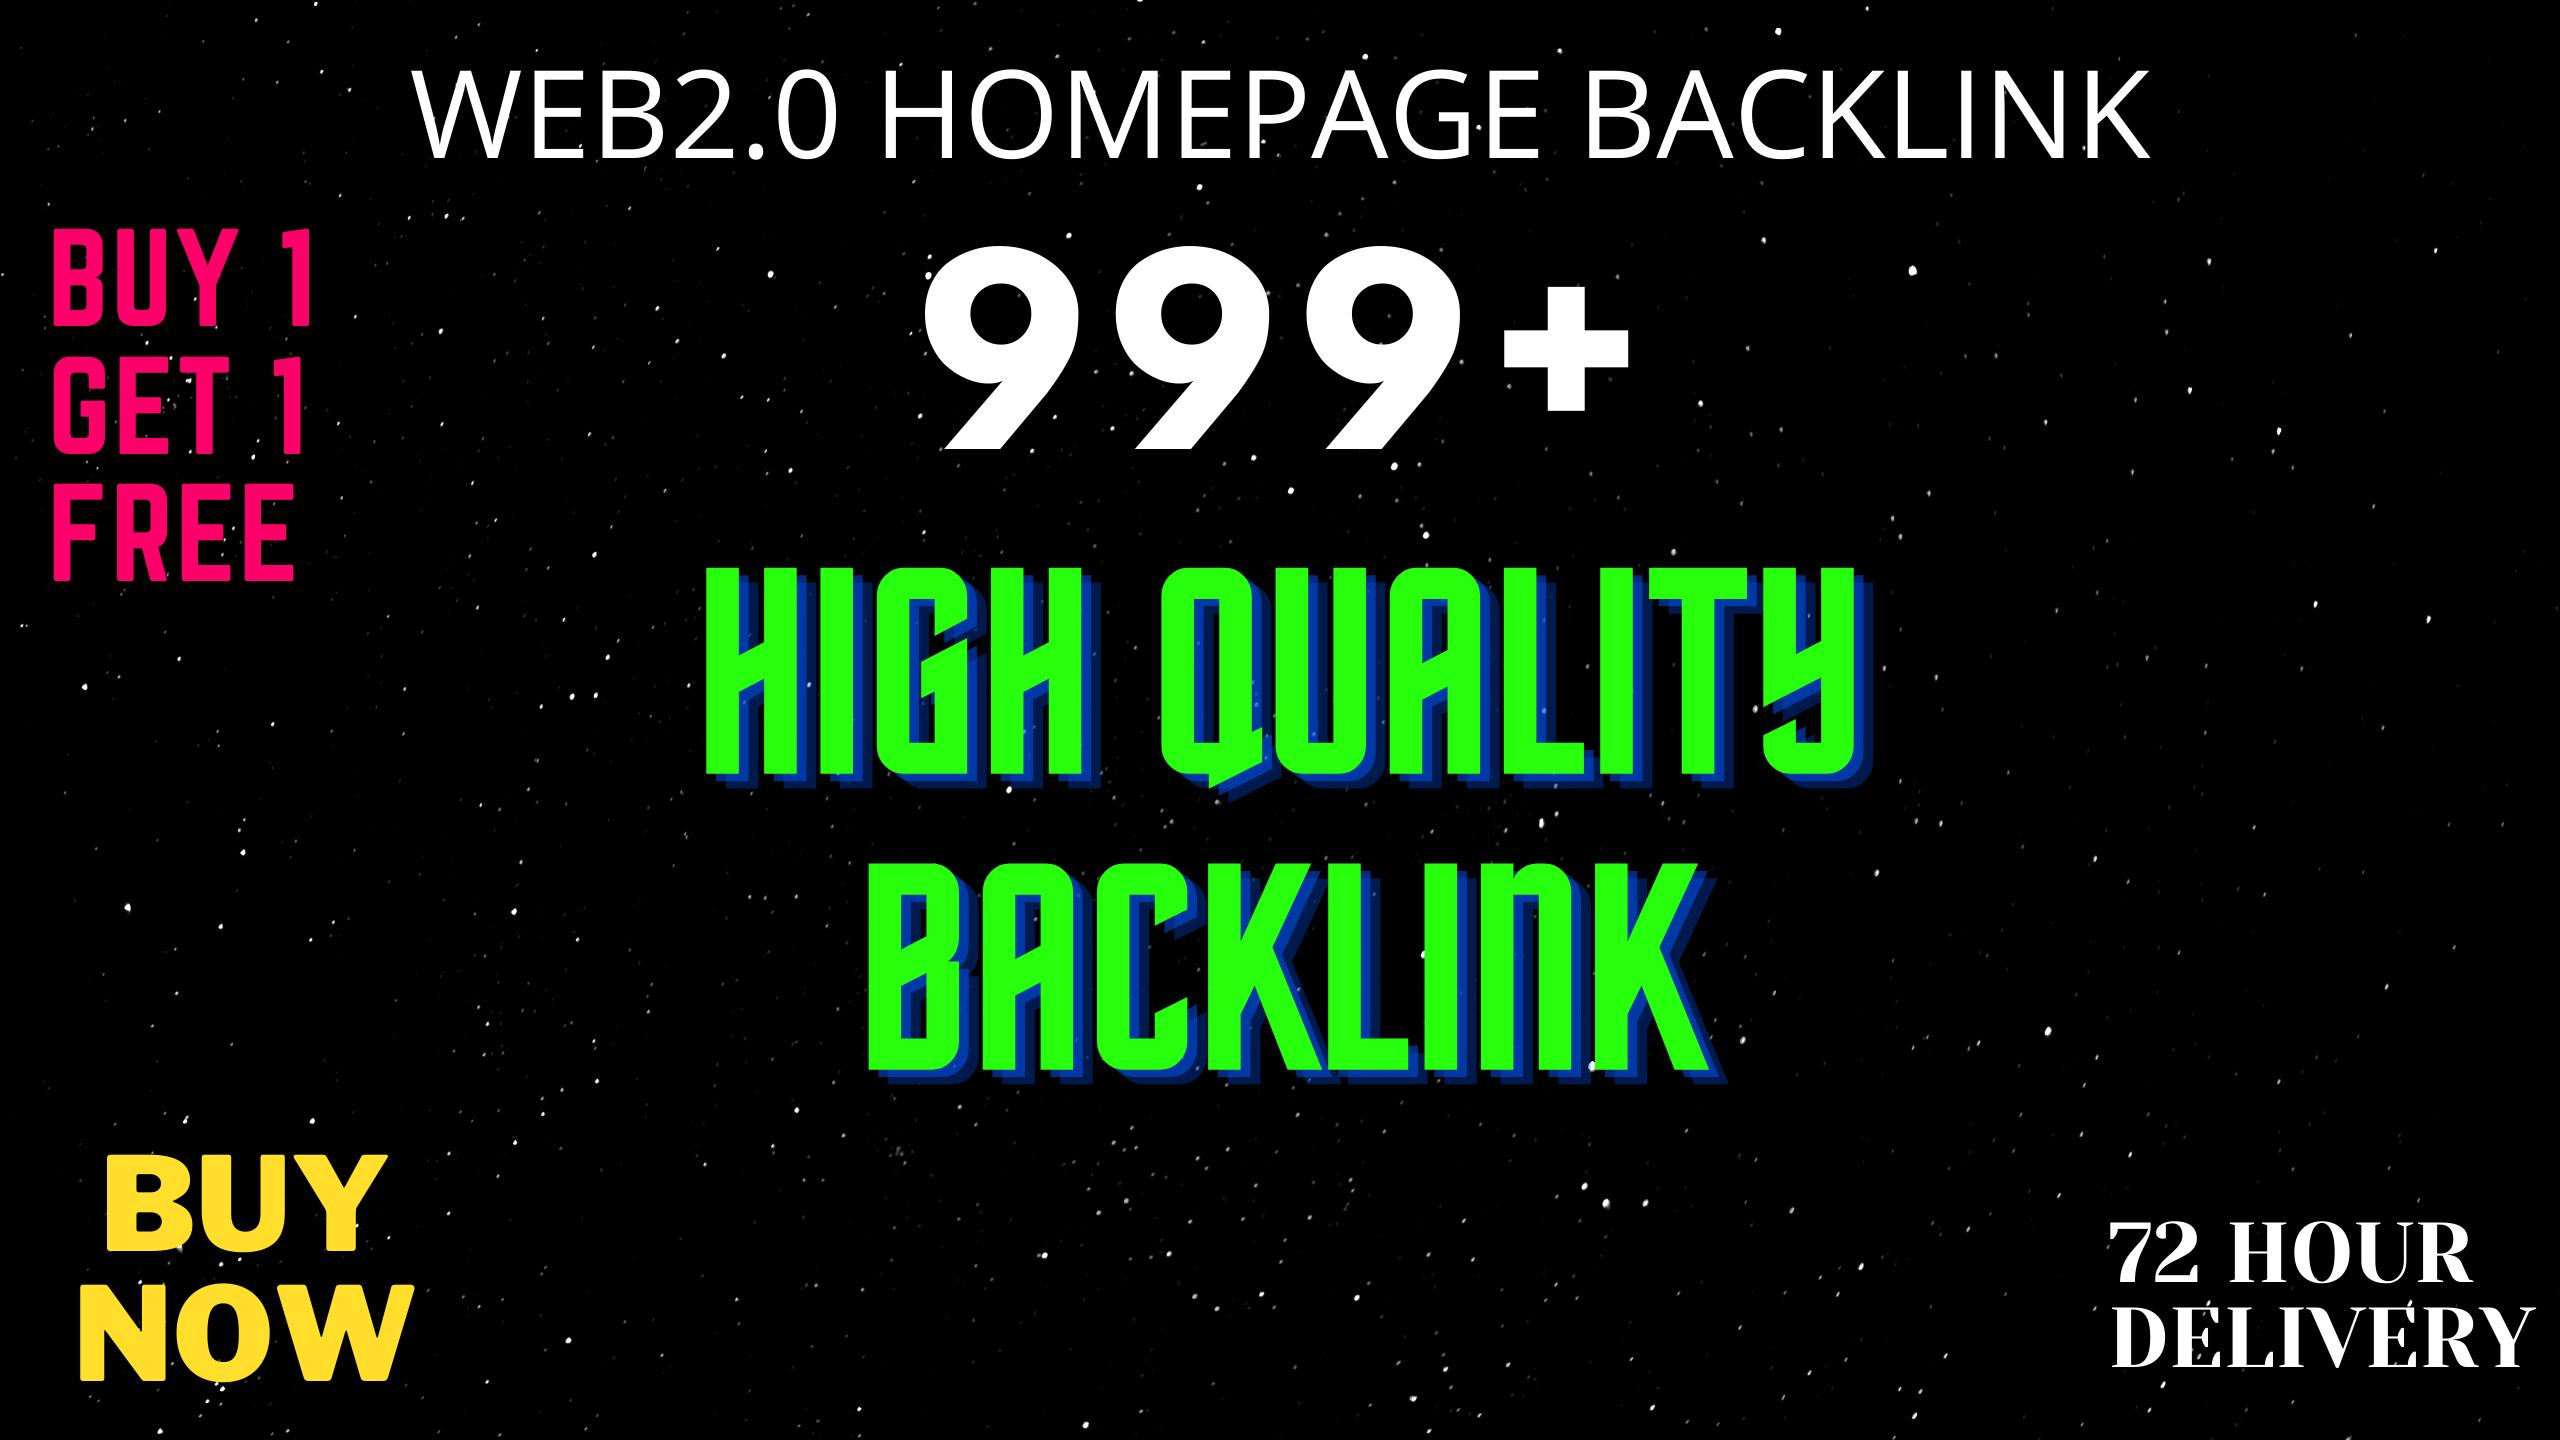 I Will Provide DA50+ PA40+ DR50+ 999+Homepage web2.0 Backlink Permanent Dofollow With unique website